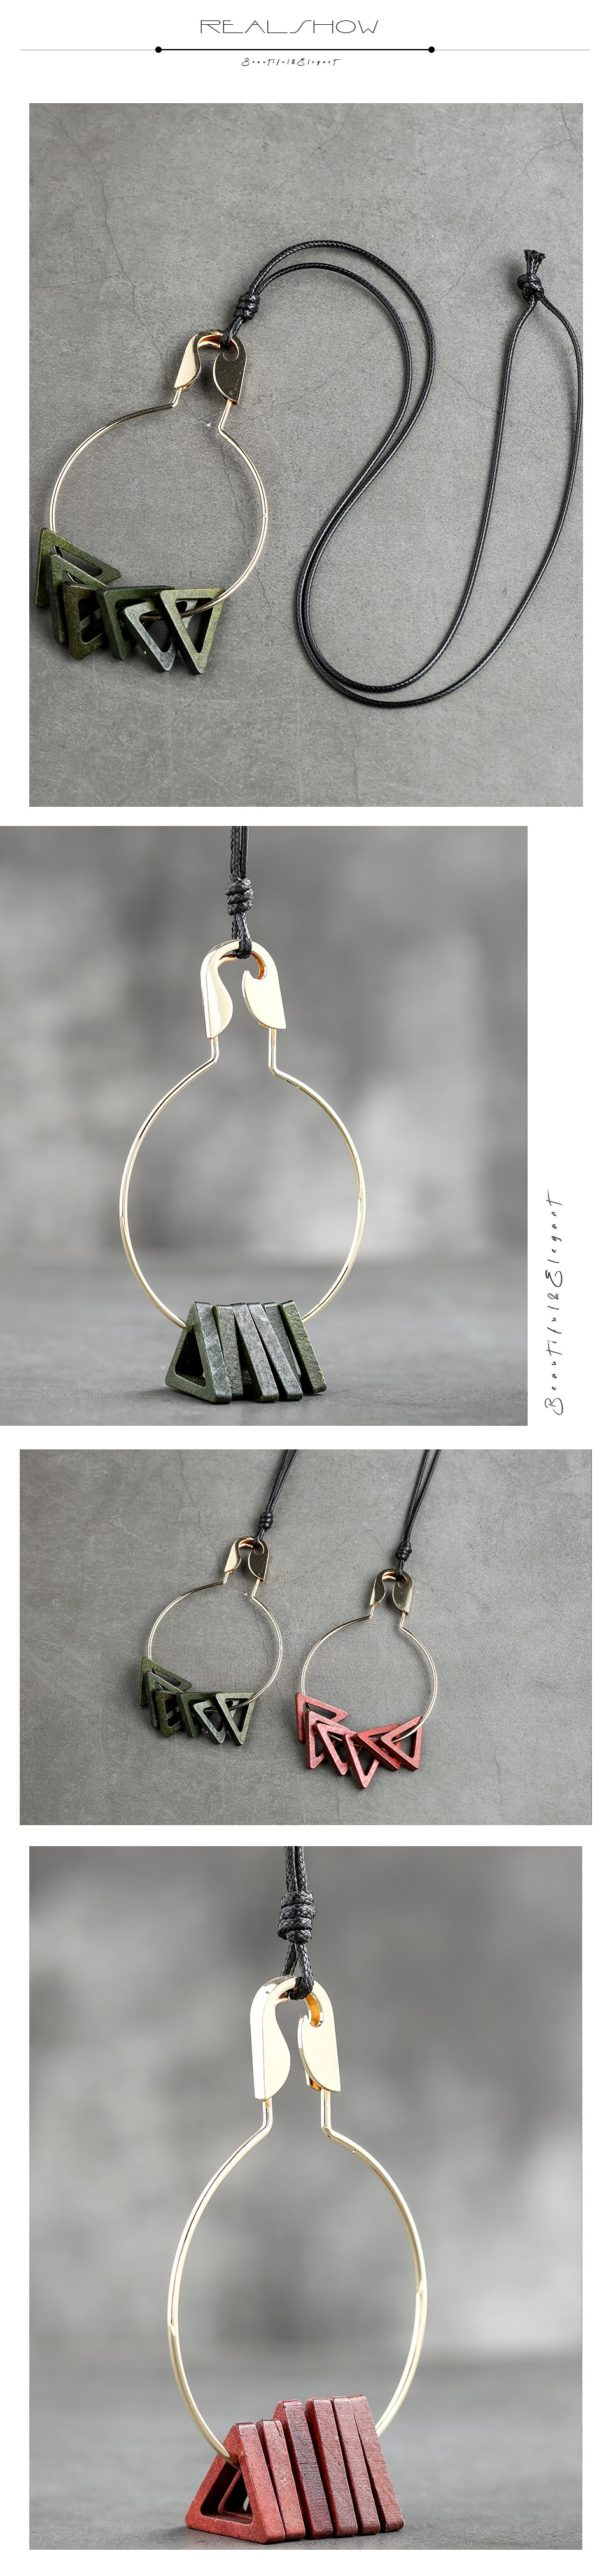 Triangle Wooden Long Chain Pendants Necklace Jewelry For Women Vintage Bohemian Suspension Neck Decoration Accessories Wholesale